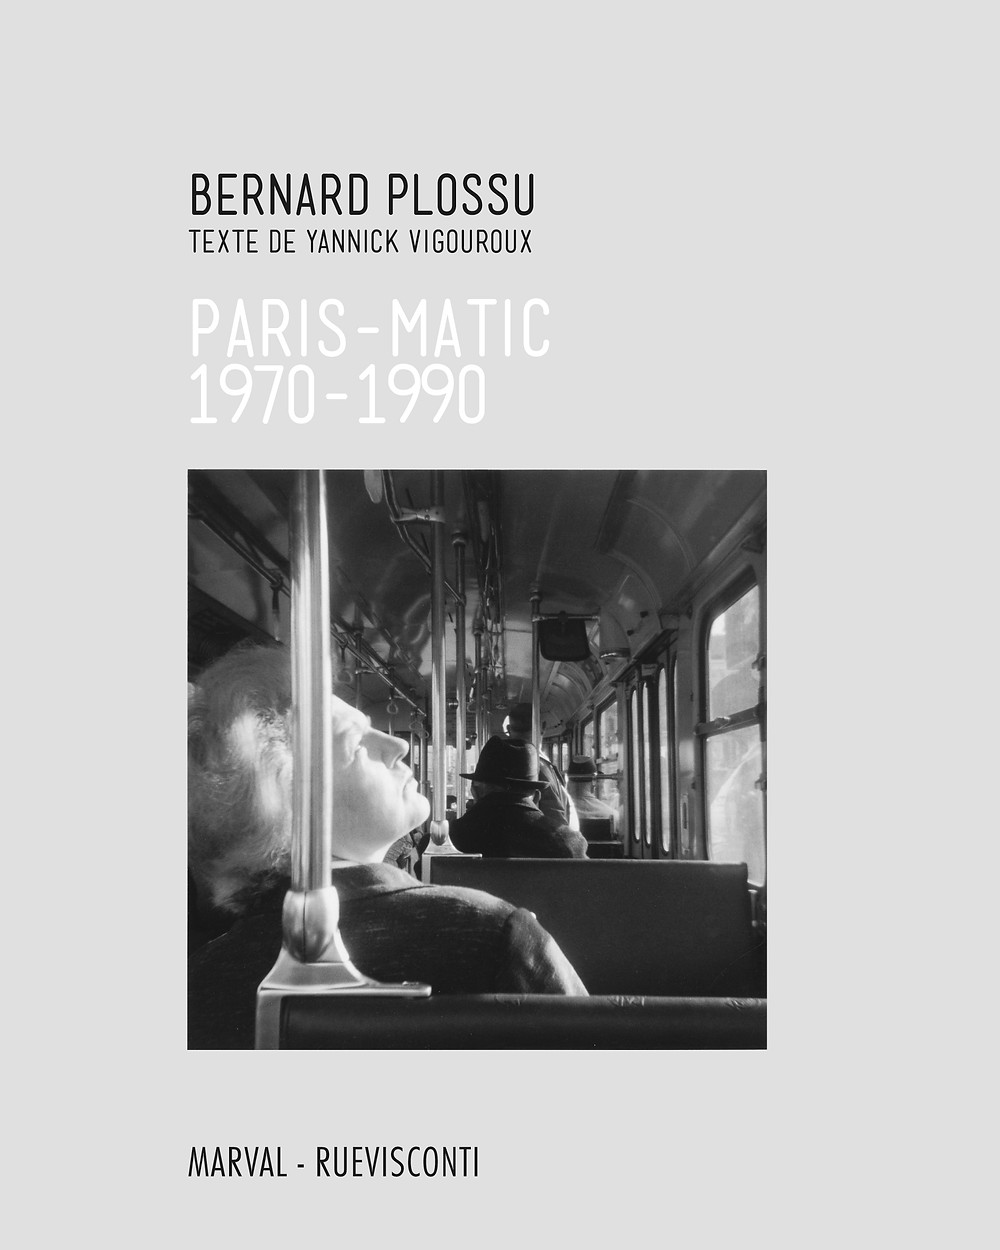 ©Bernard Plossu